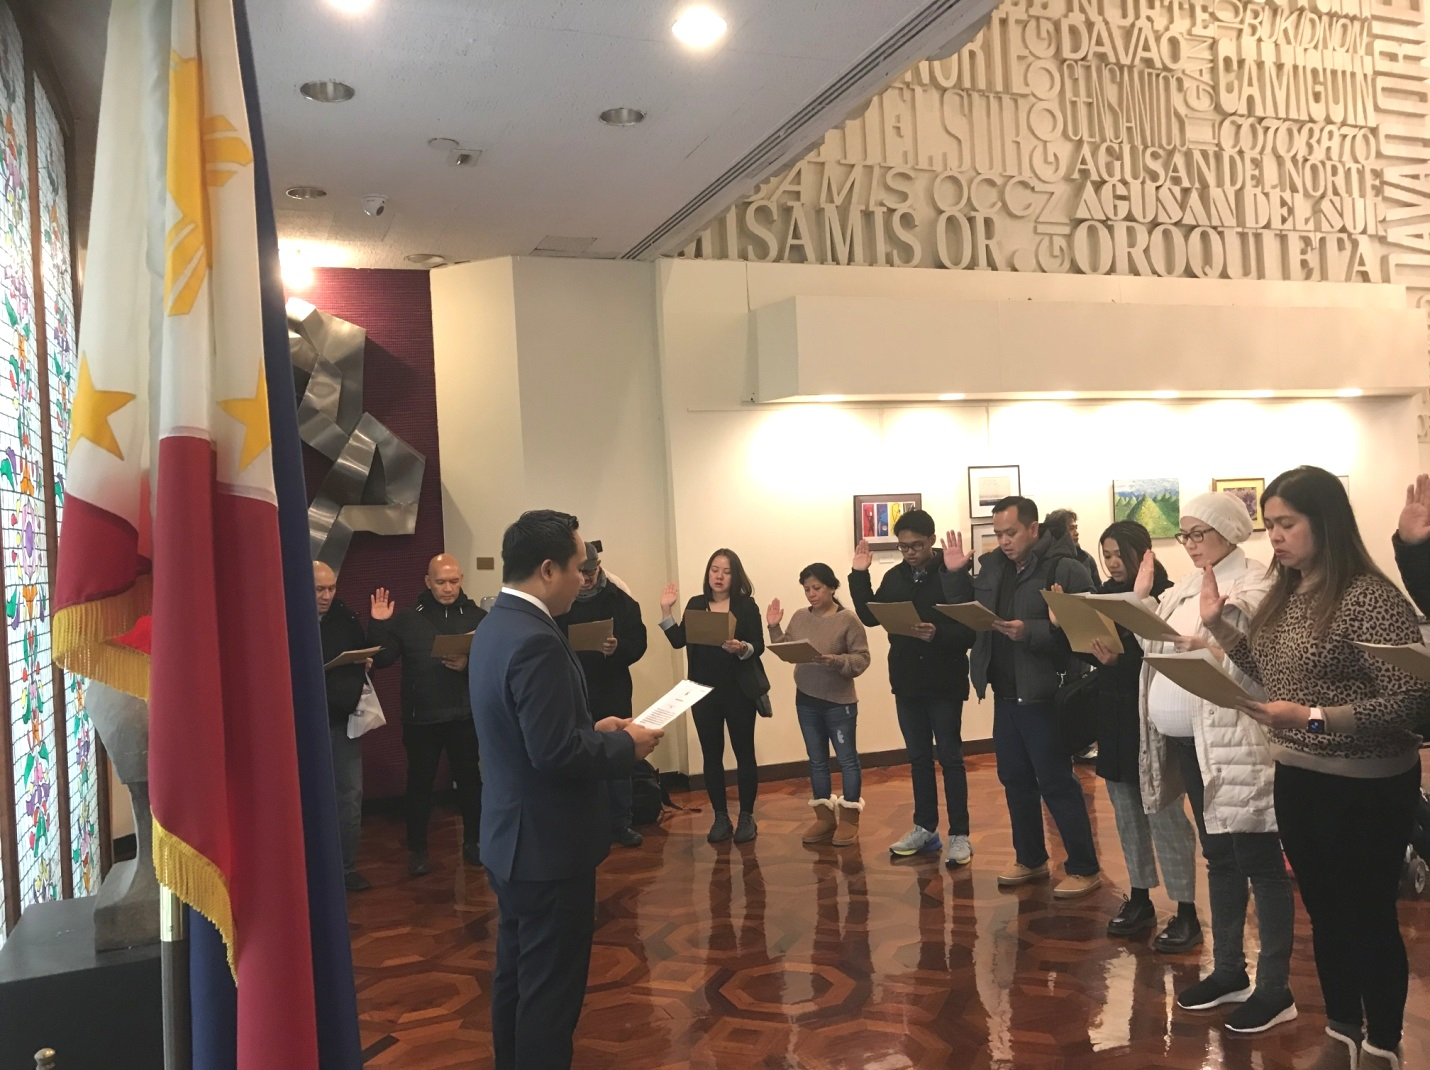 PH Consulate in New York Opens for 1st Consulate Saturday in 2020